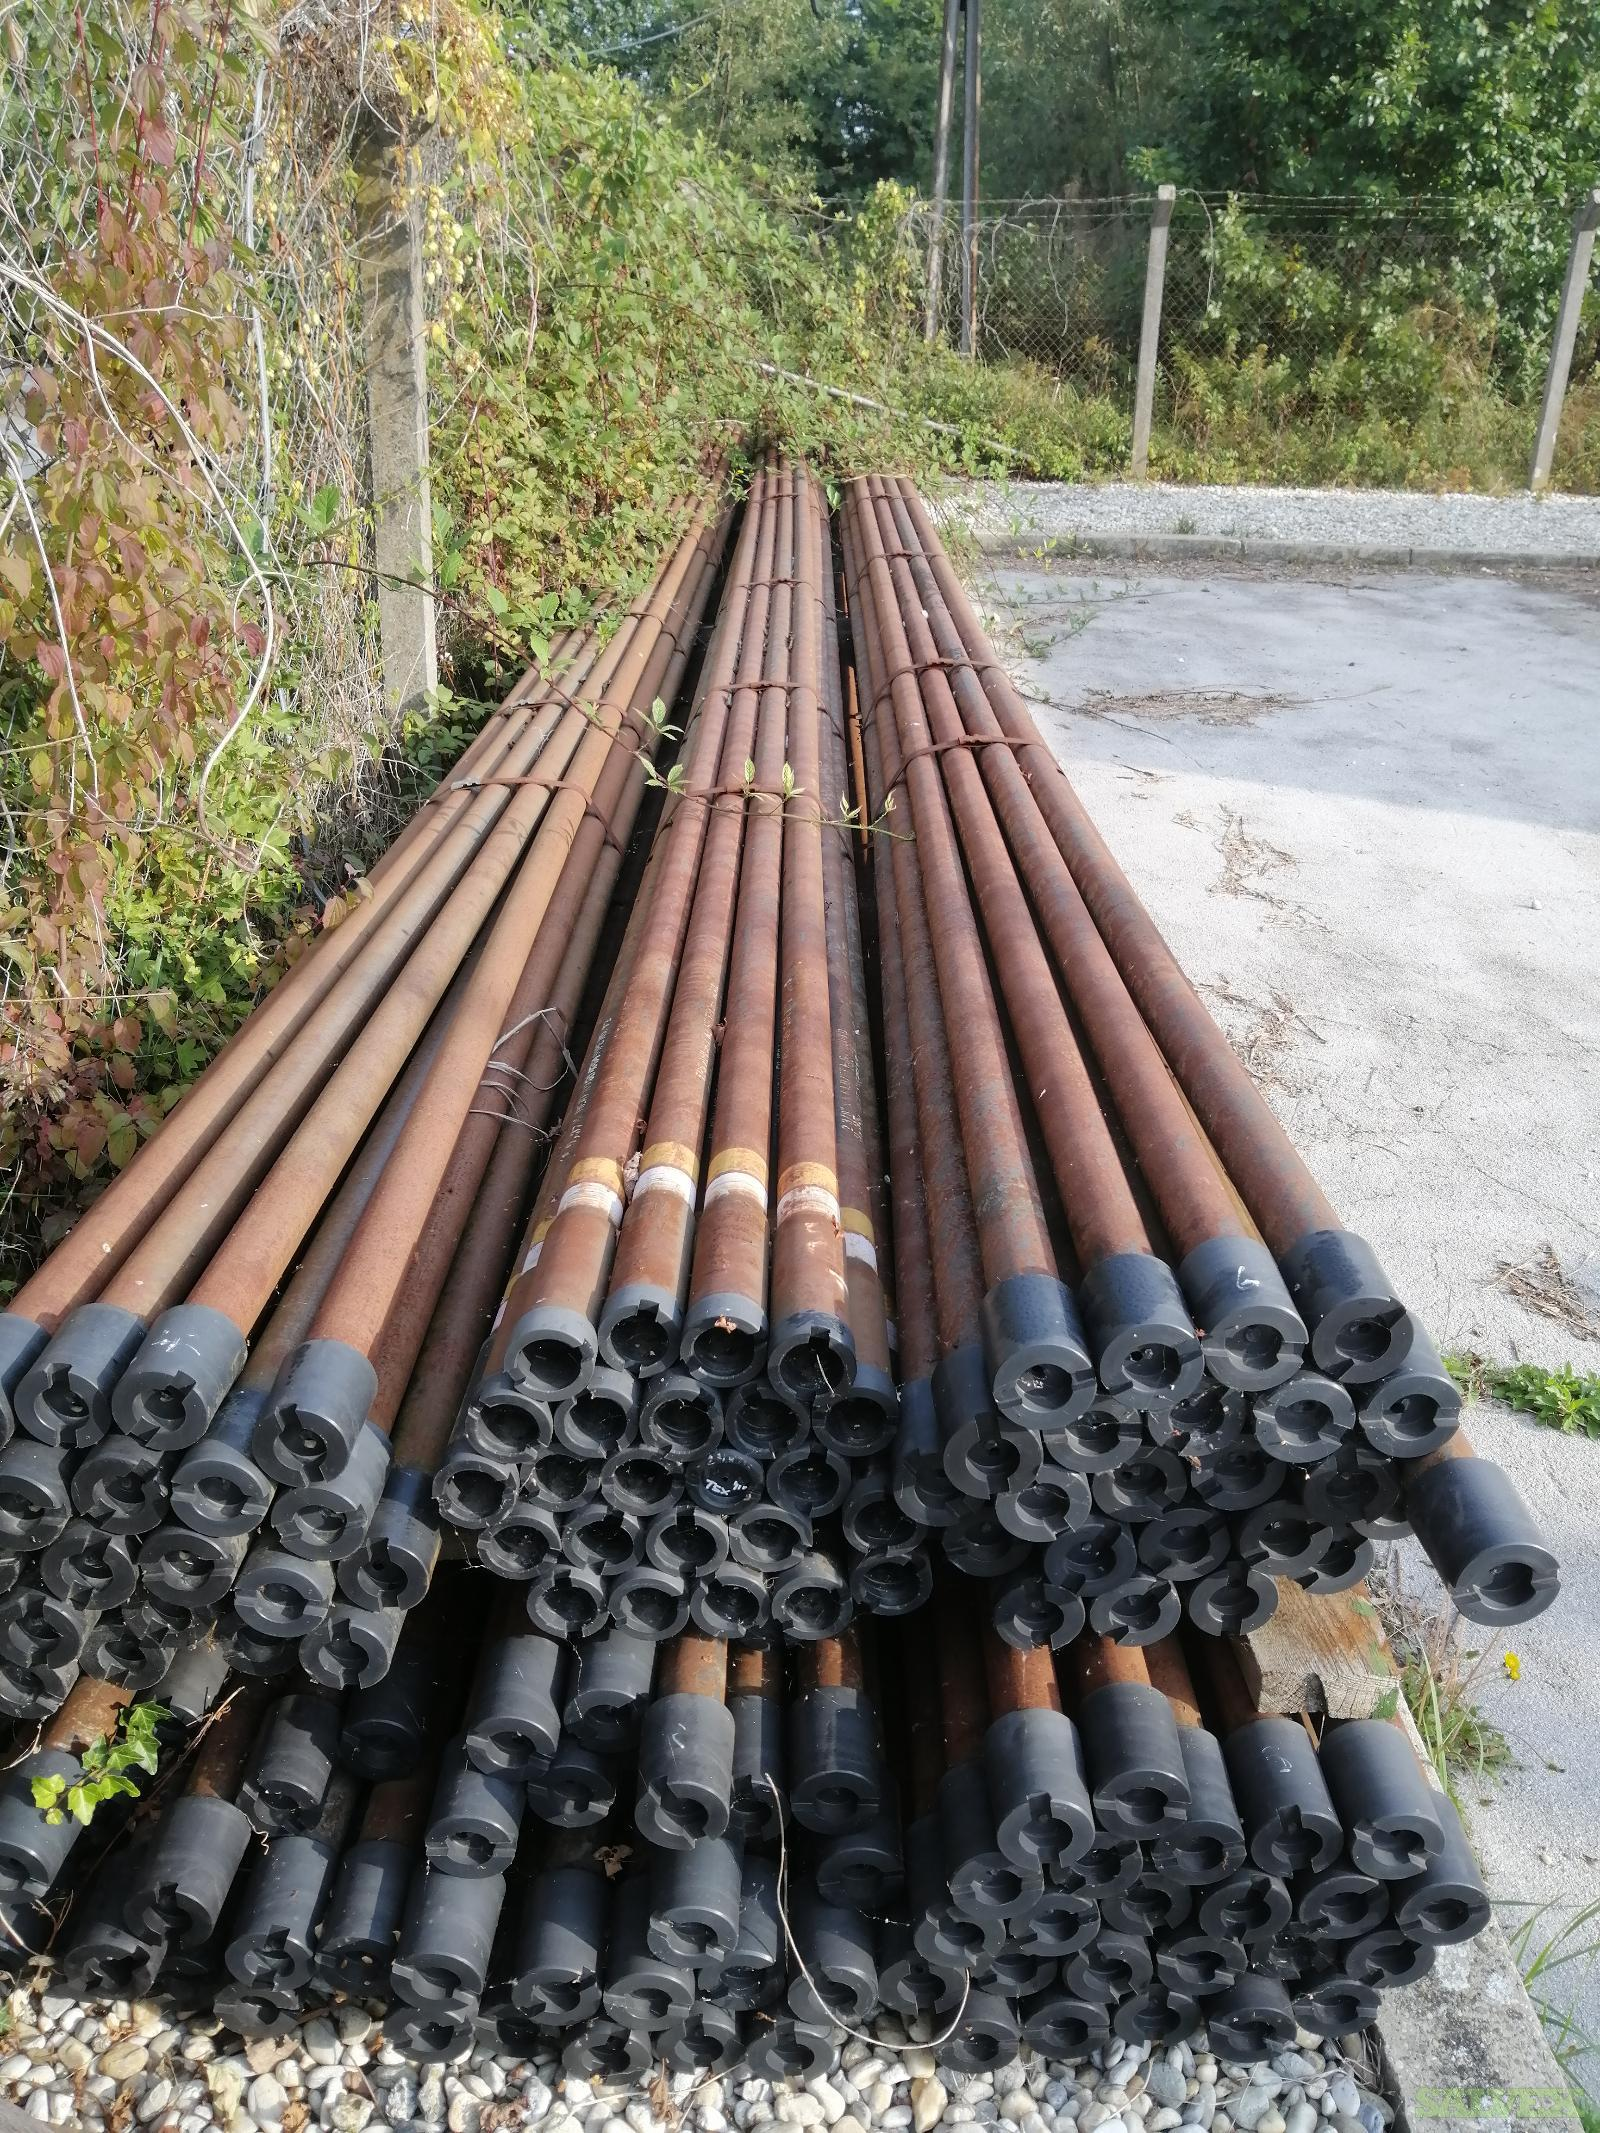 2 3/8 4.60# L80 Techniseal R2 Surplus Tubing (4,134 Feet / 9 Metric Tons)